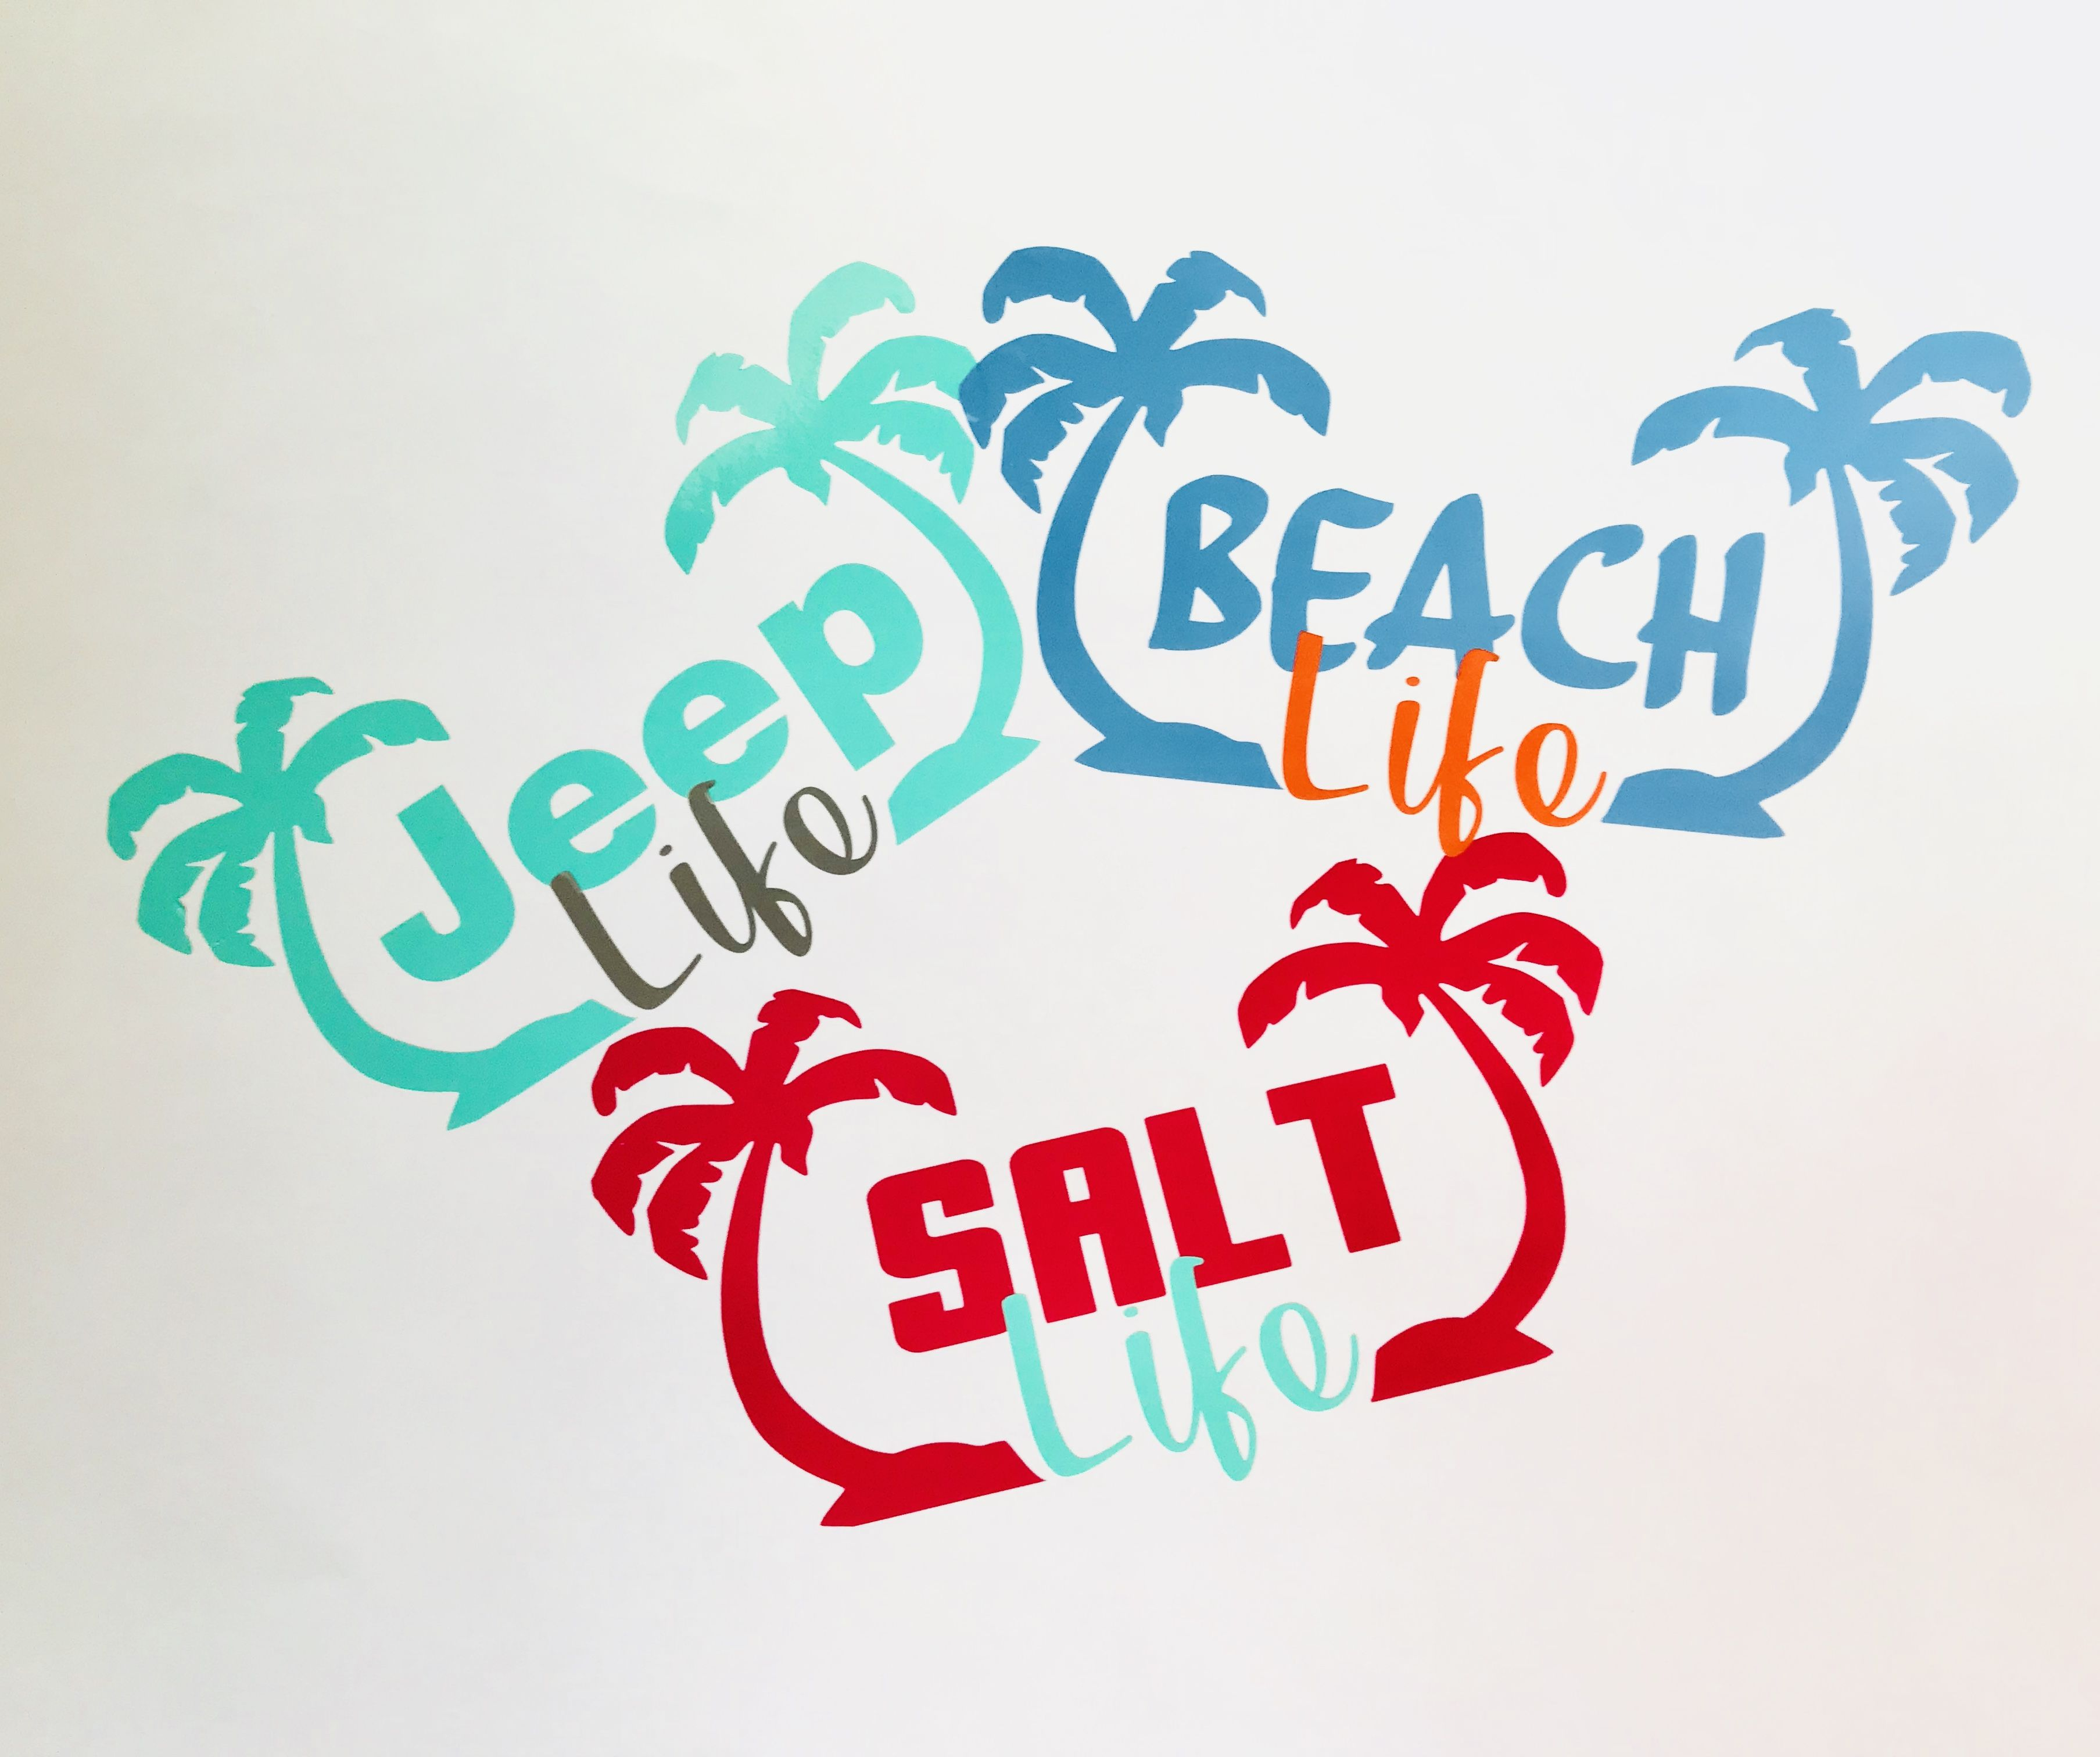 Summer decals jeep lifebeach lifesalt water ocean fun custom stickers www etsy com shop southcoastvinylusa